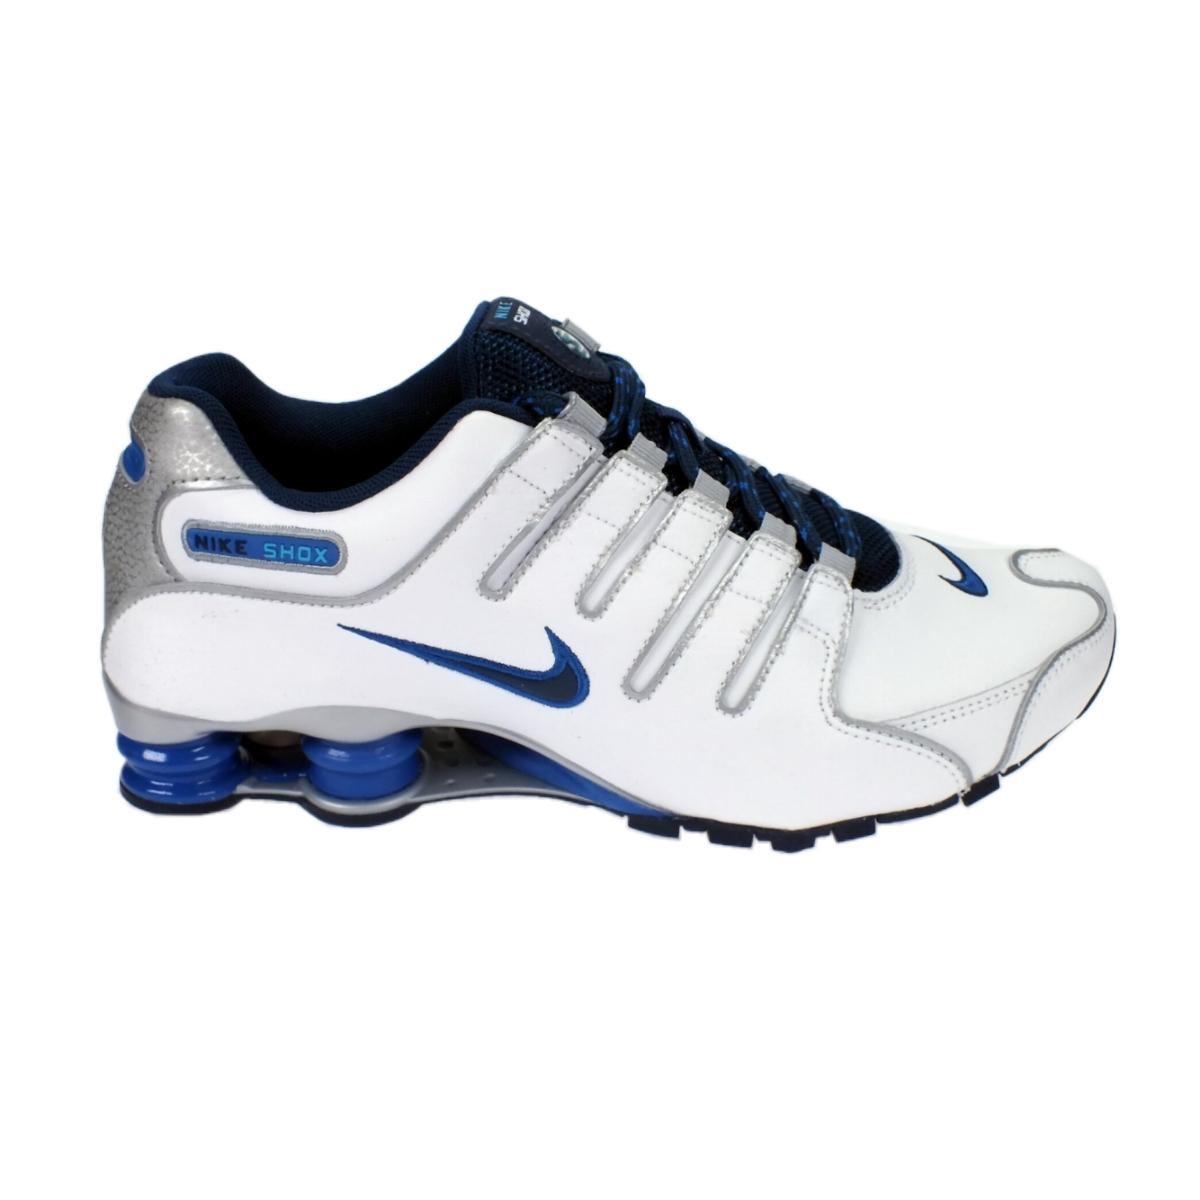 Nike-Shox-NZ-EU-Herren-Schuhe-Turnschuhe-Schwarz-Weiss